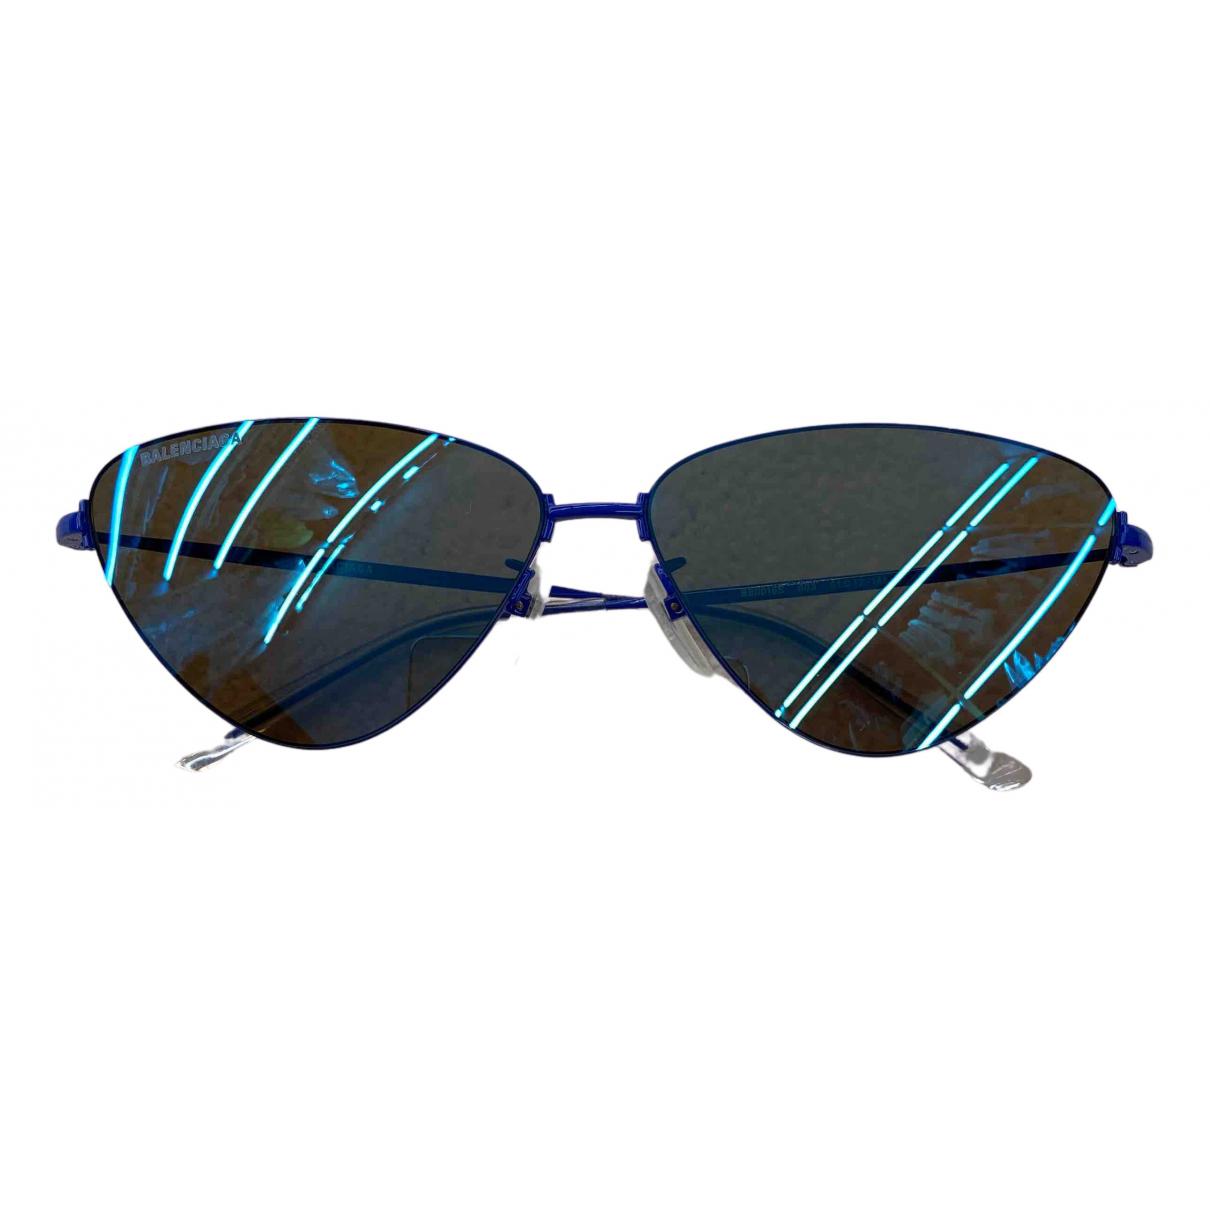 Balenciaga Invisible Cat Sonnenbrillen in  Blau Metall